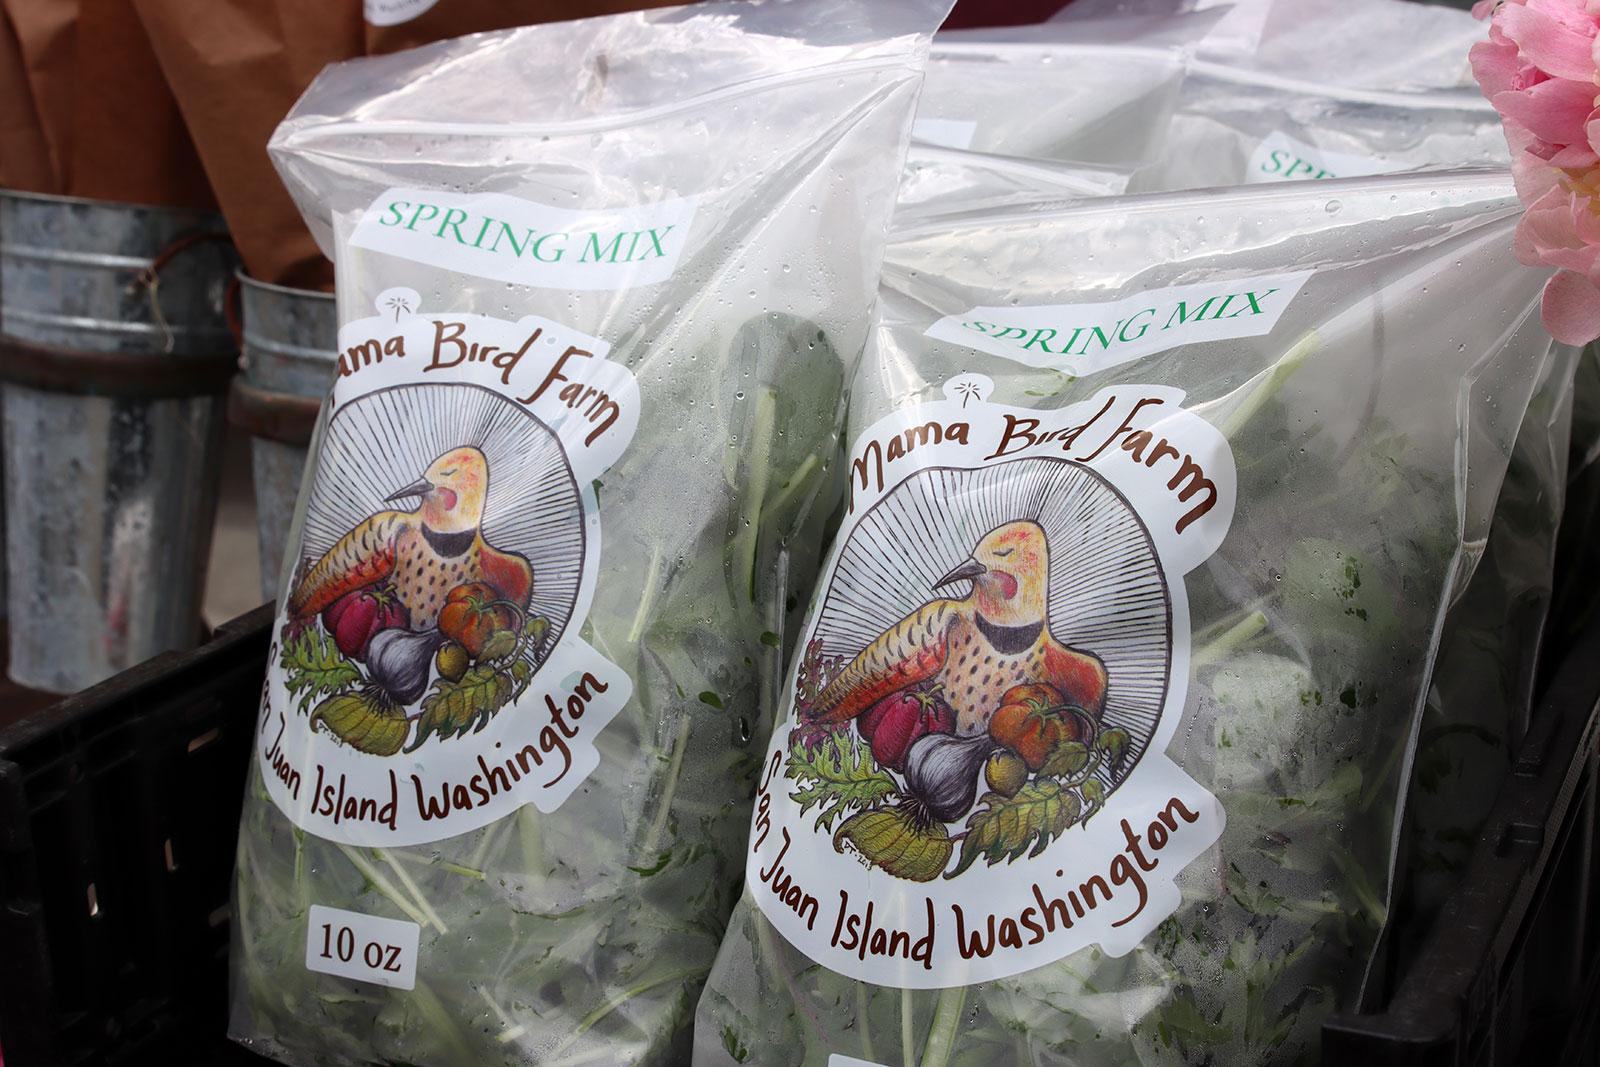 Mama Bird Farm salad mix